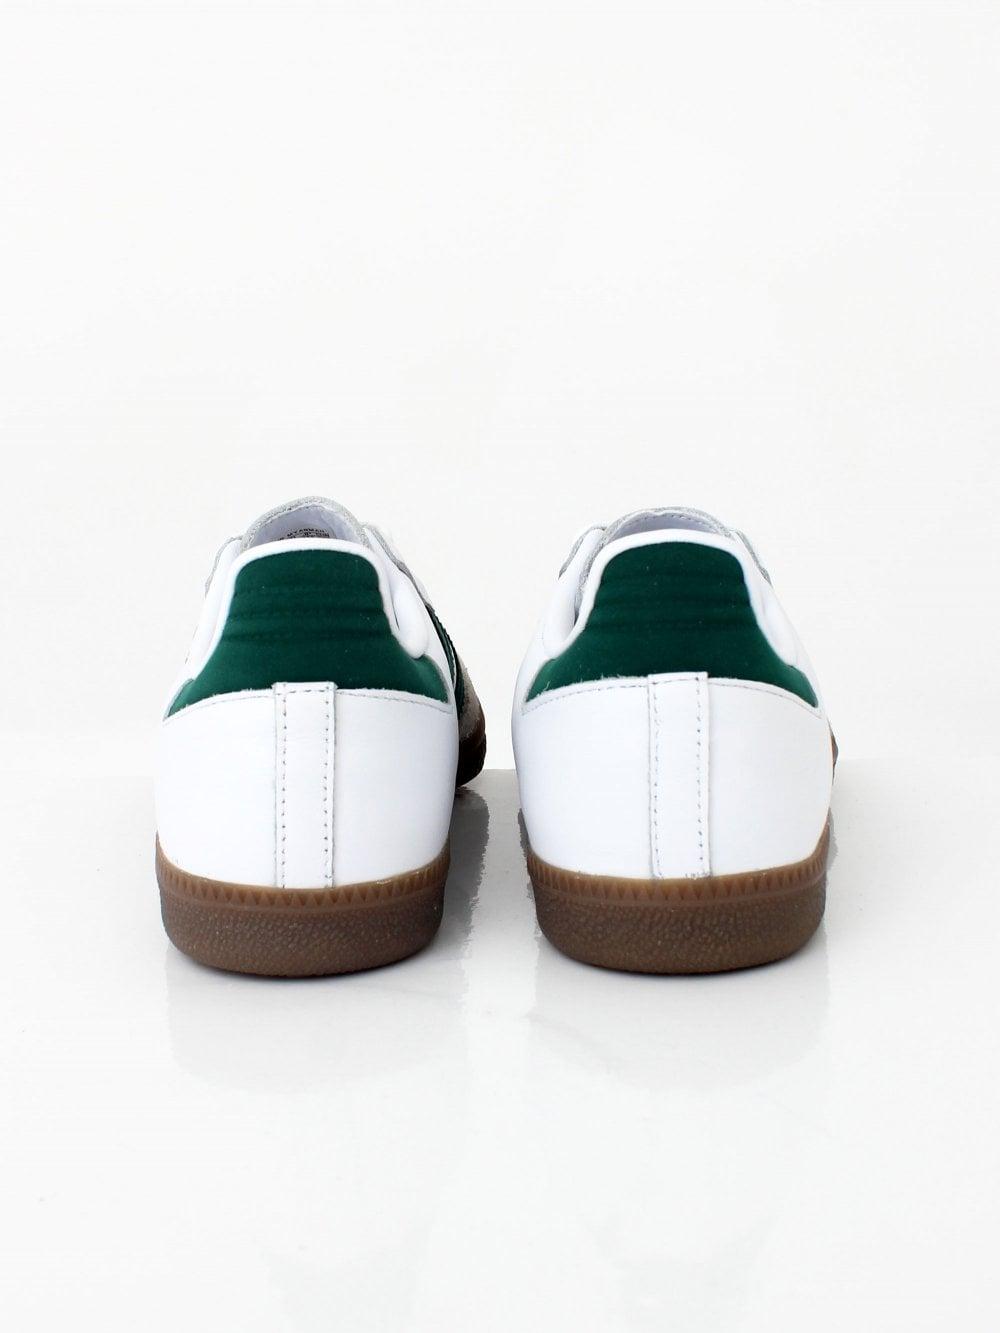 white and green sambas